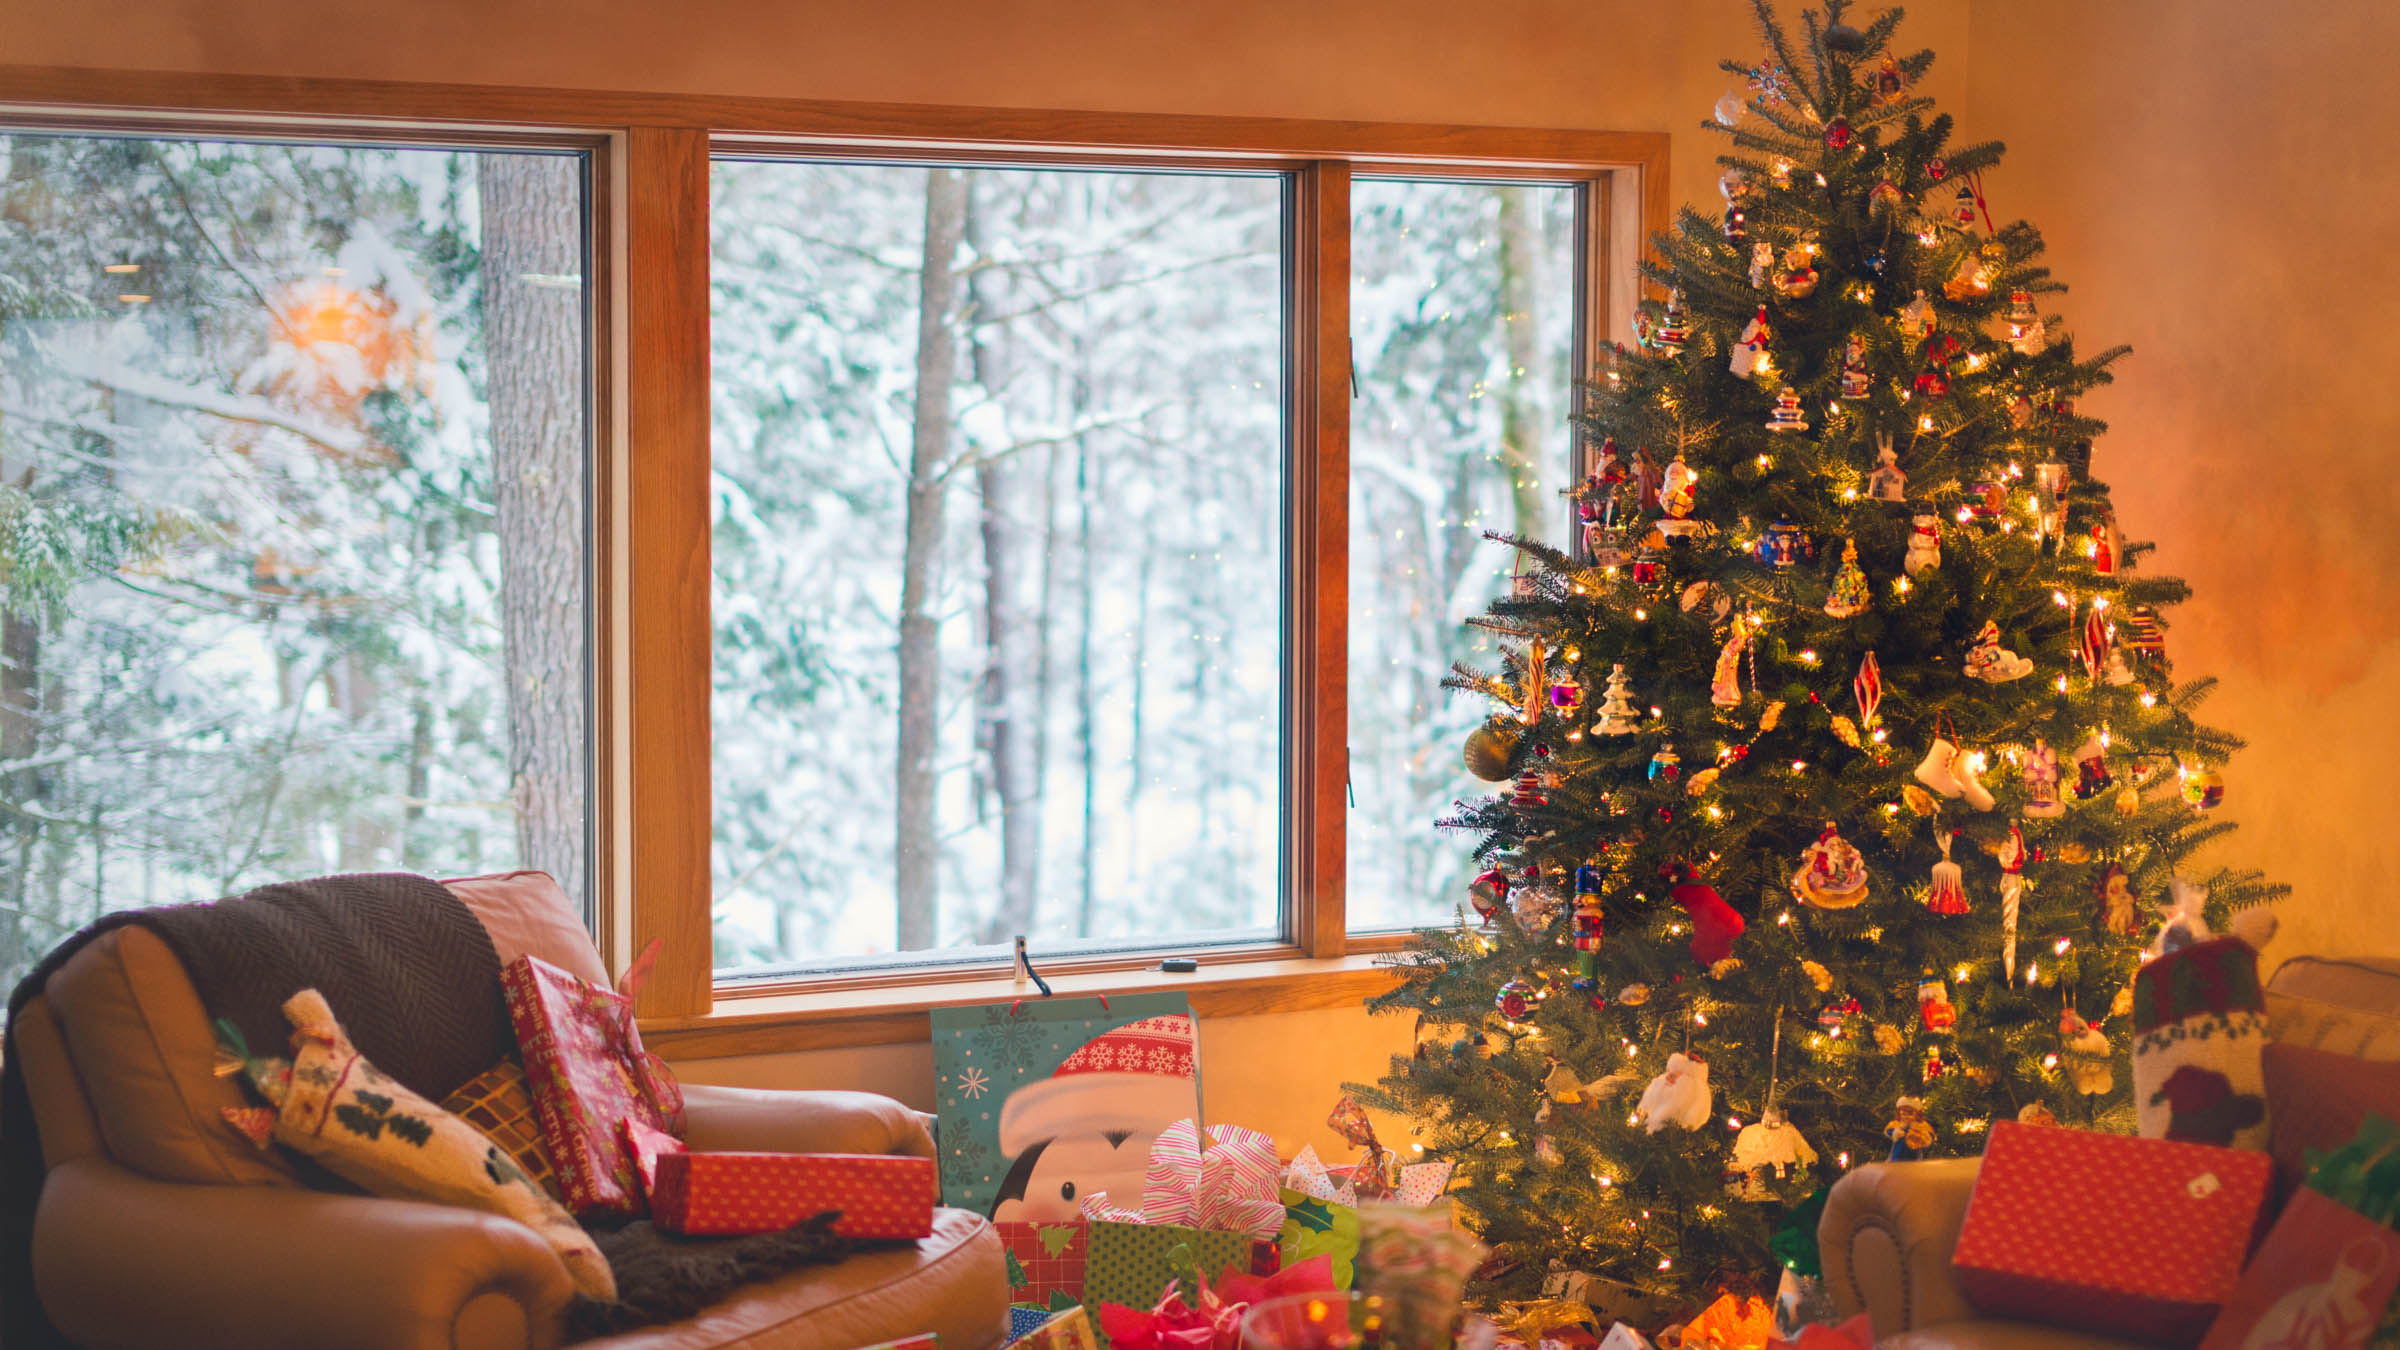 Getting Creative on Christmas Morning | Photofocus